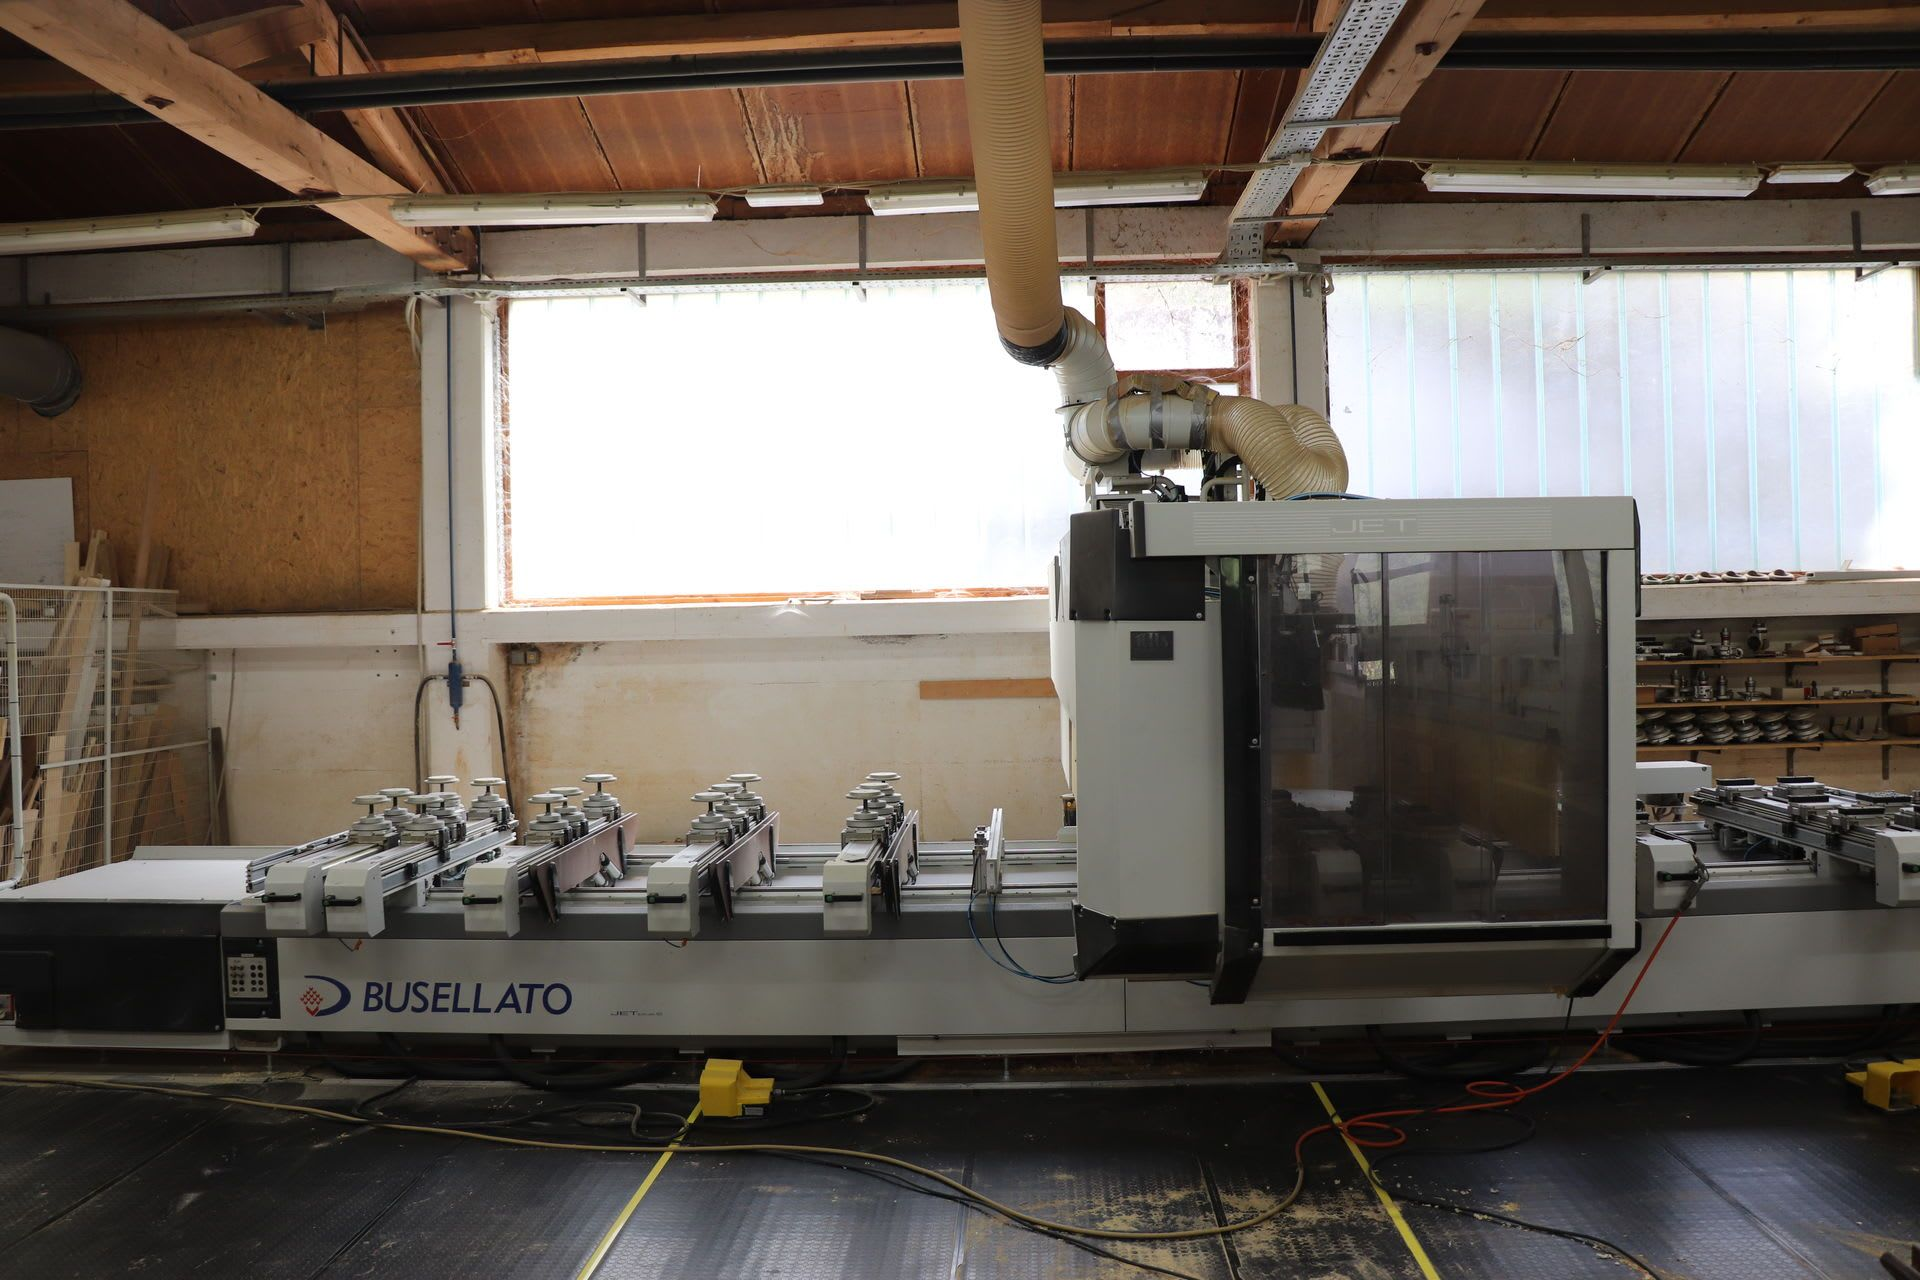 BUSELLATO Jet Plus XXL CNC-Bearbeitungszentrum